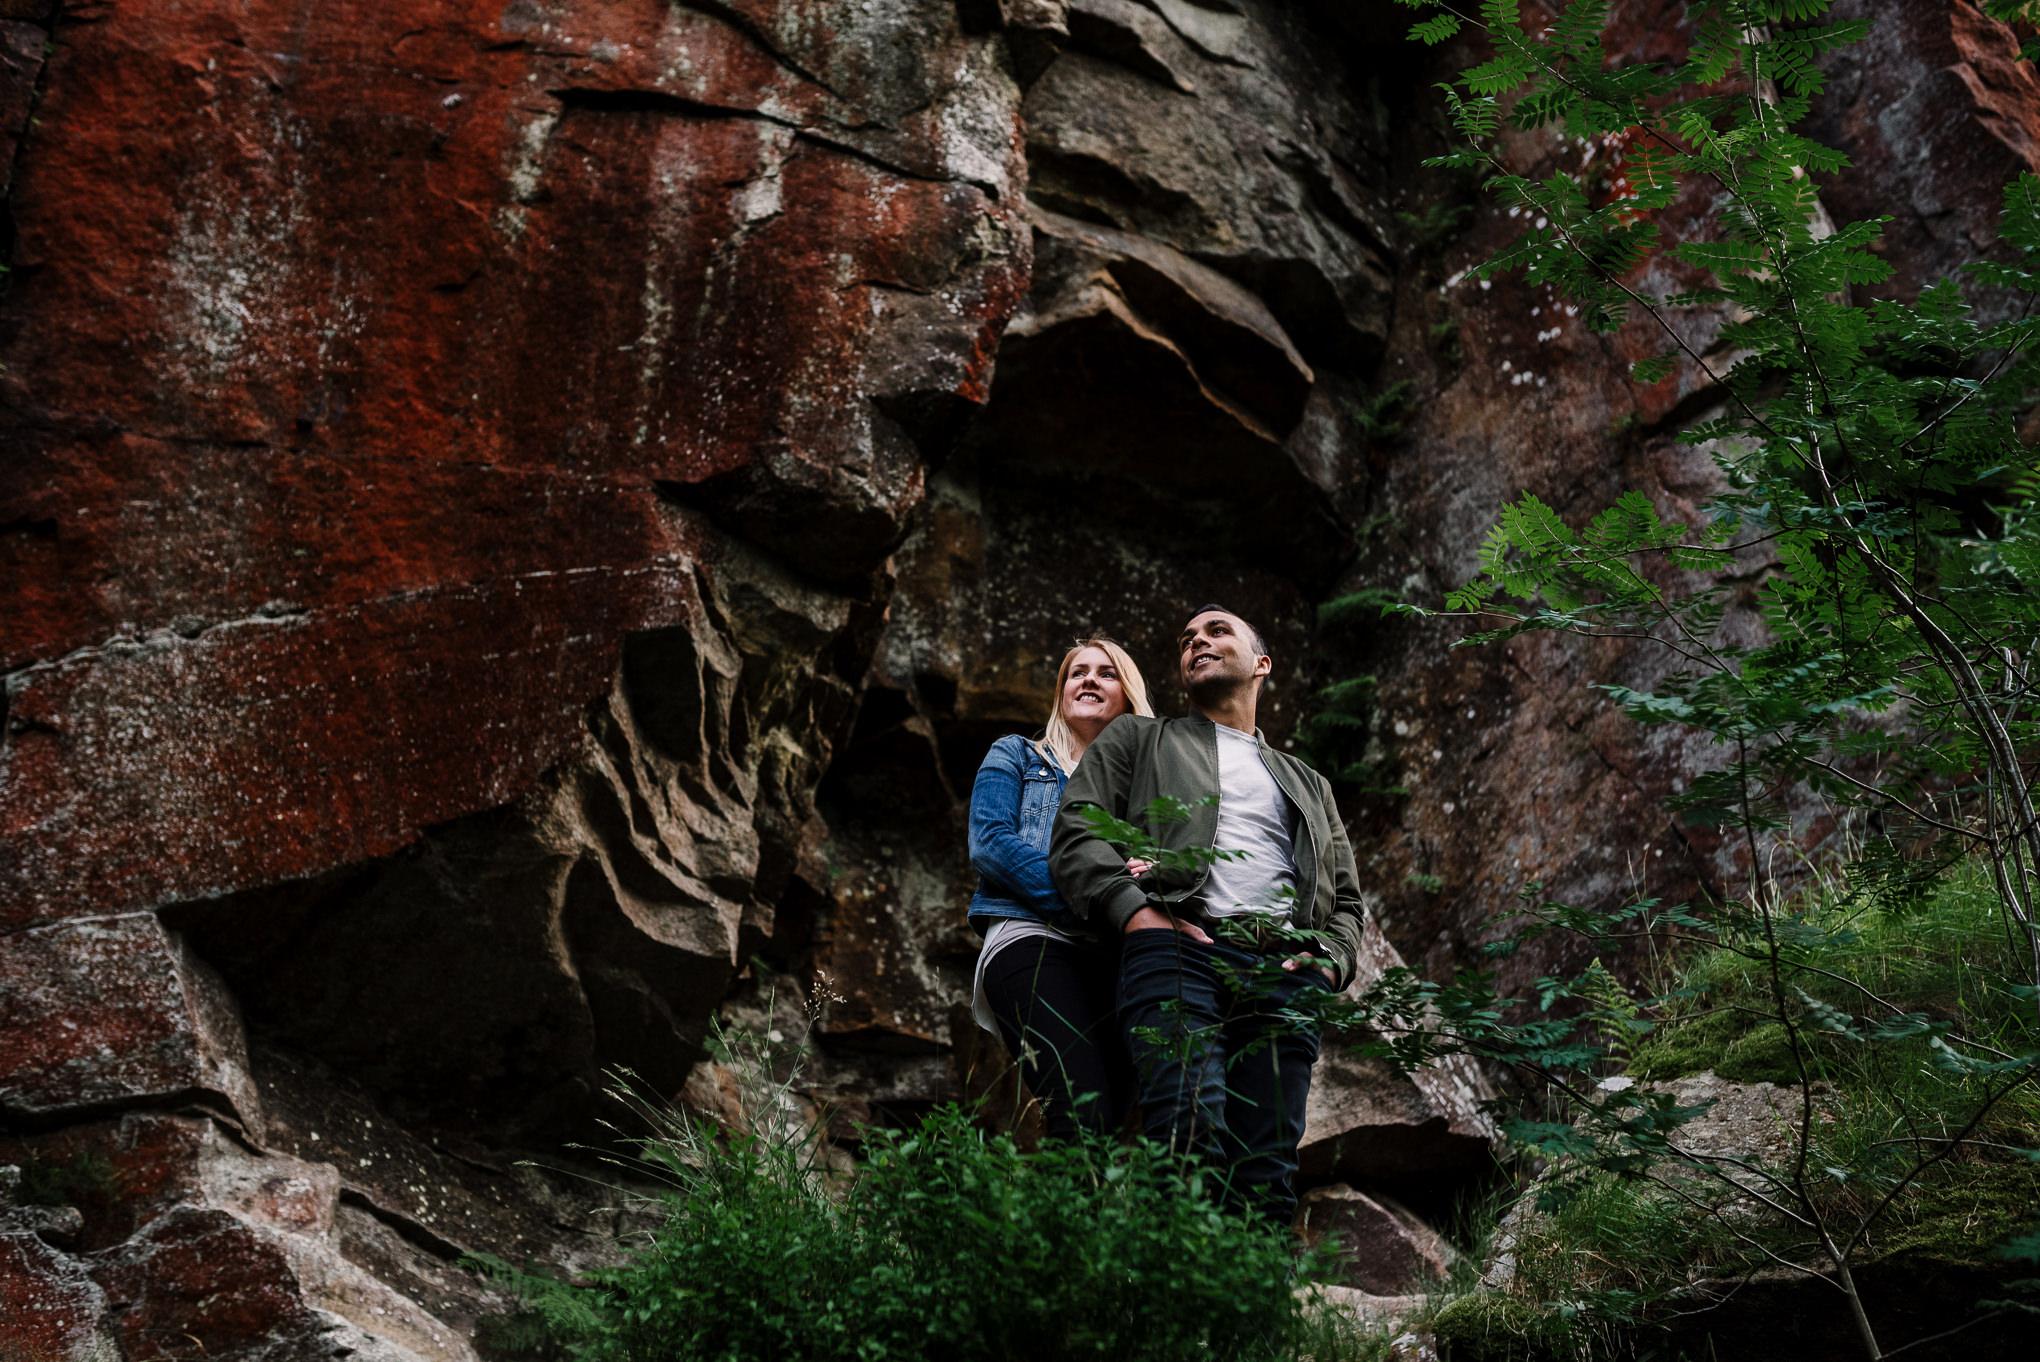 Infront of cliff face at Entwistle Reservoir. Lancashire lifestyle photographer